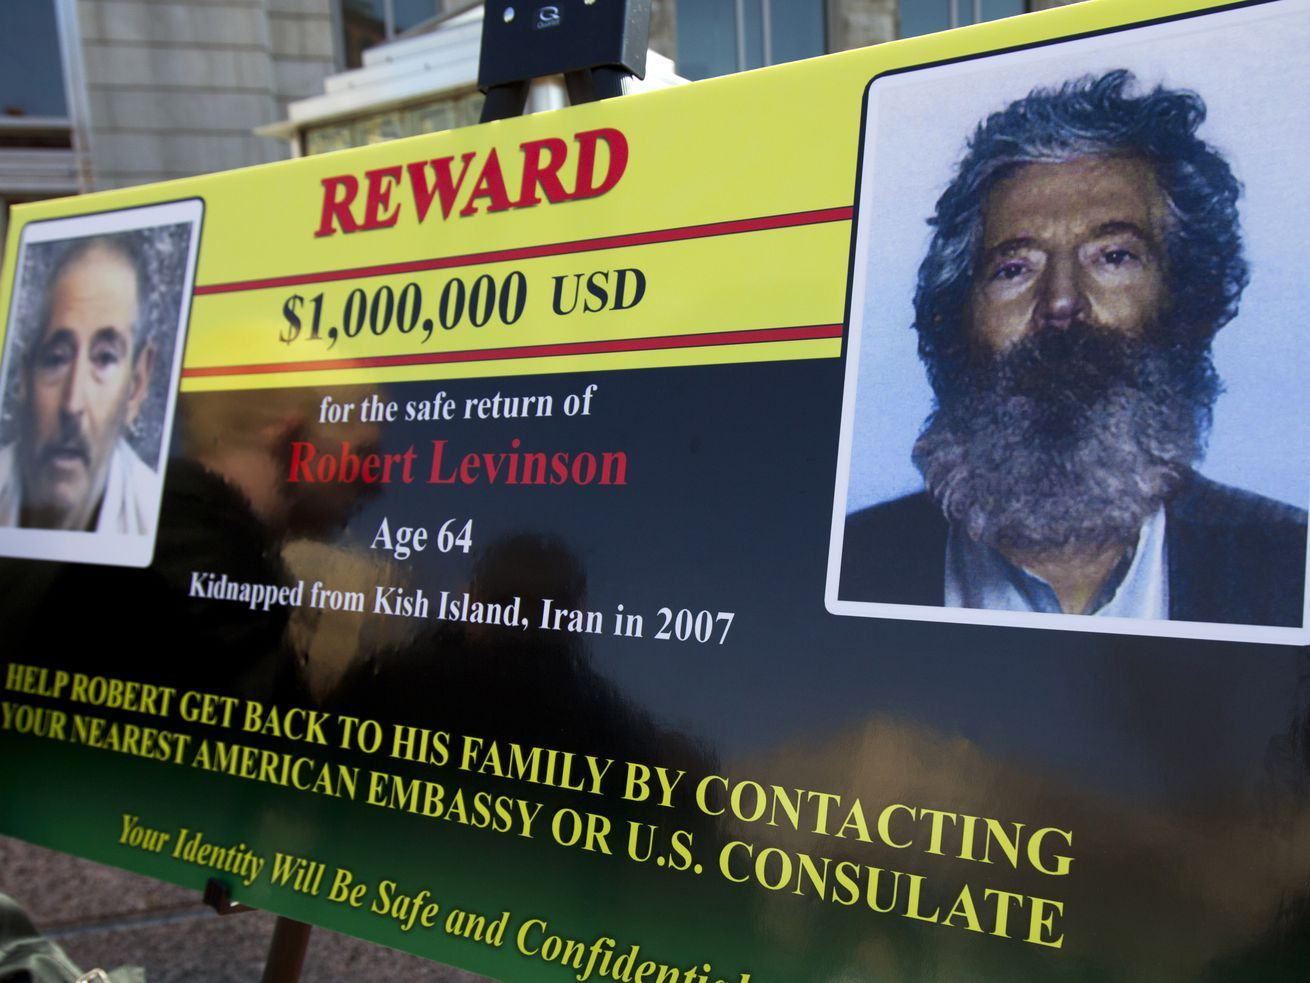 U.S. believes exFBI agent Robert Levinson has died in